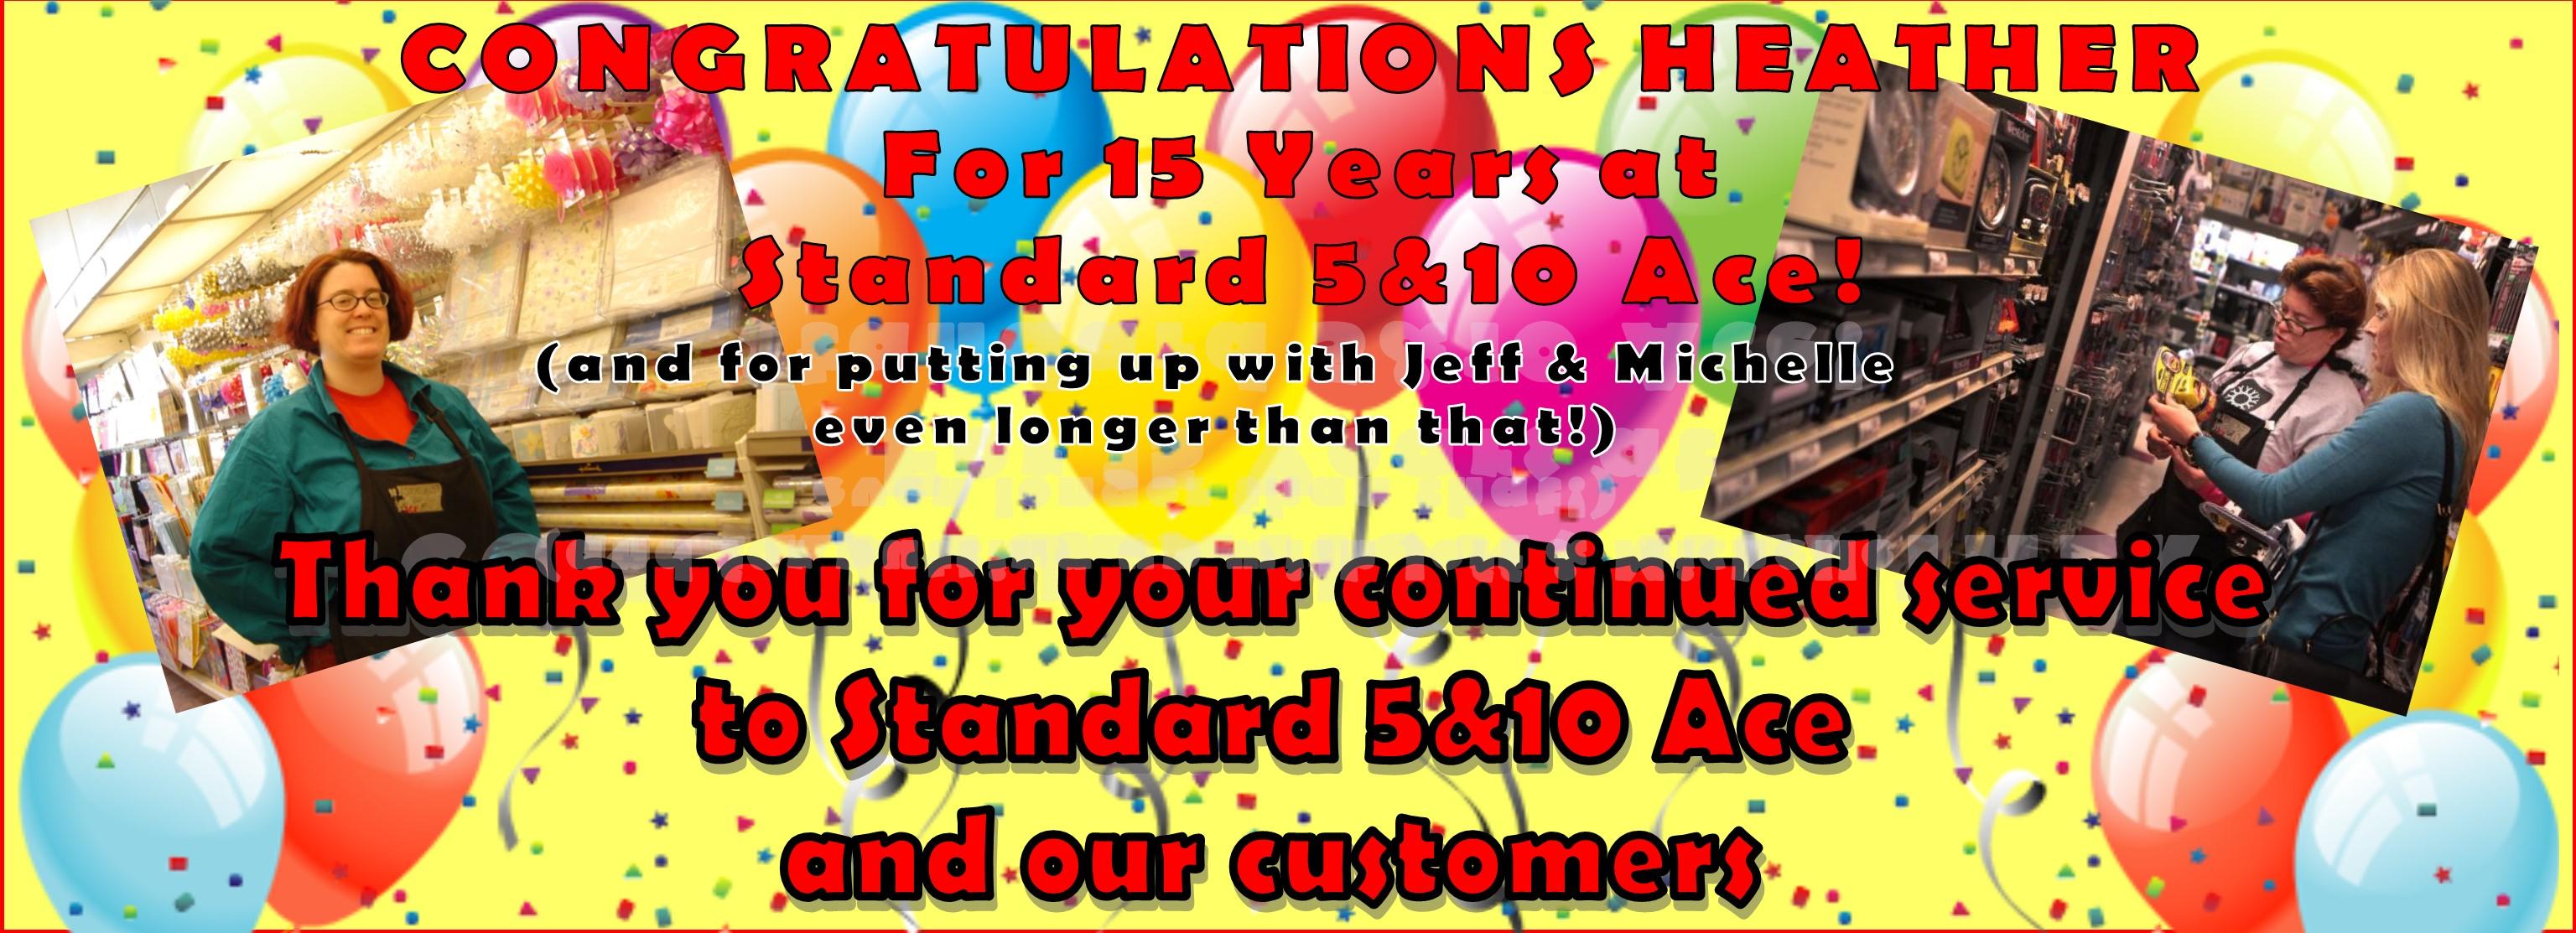 Congratulations Heather!